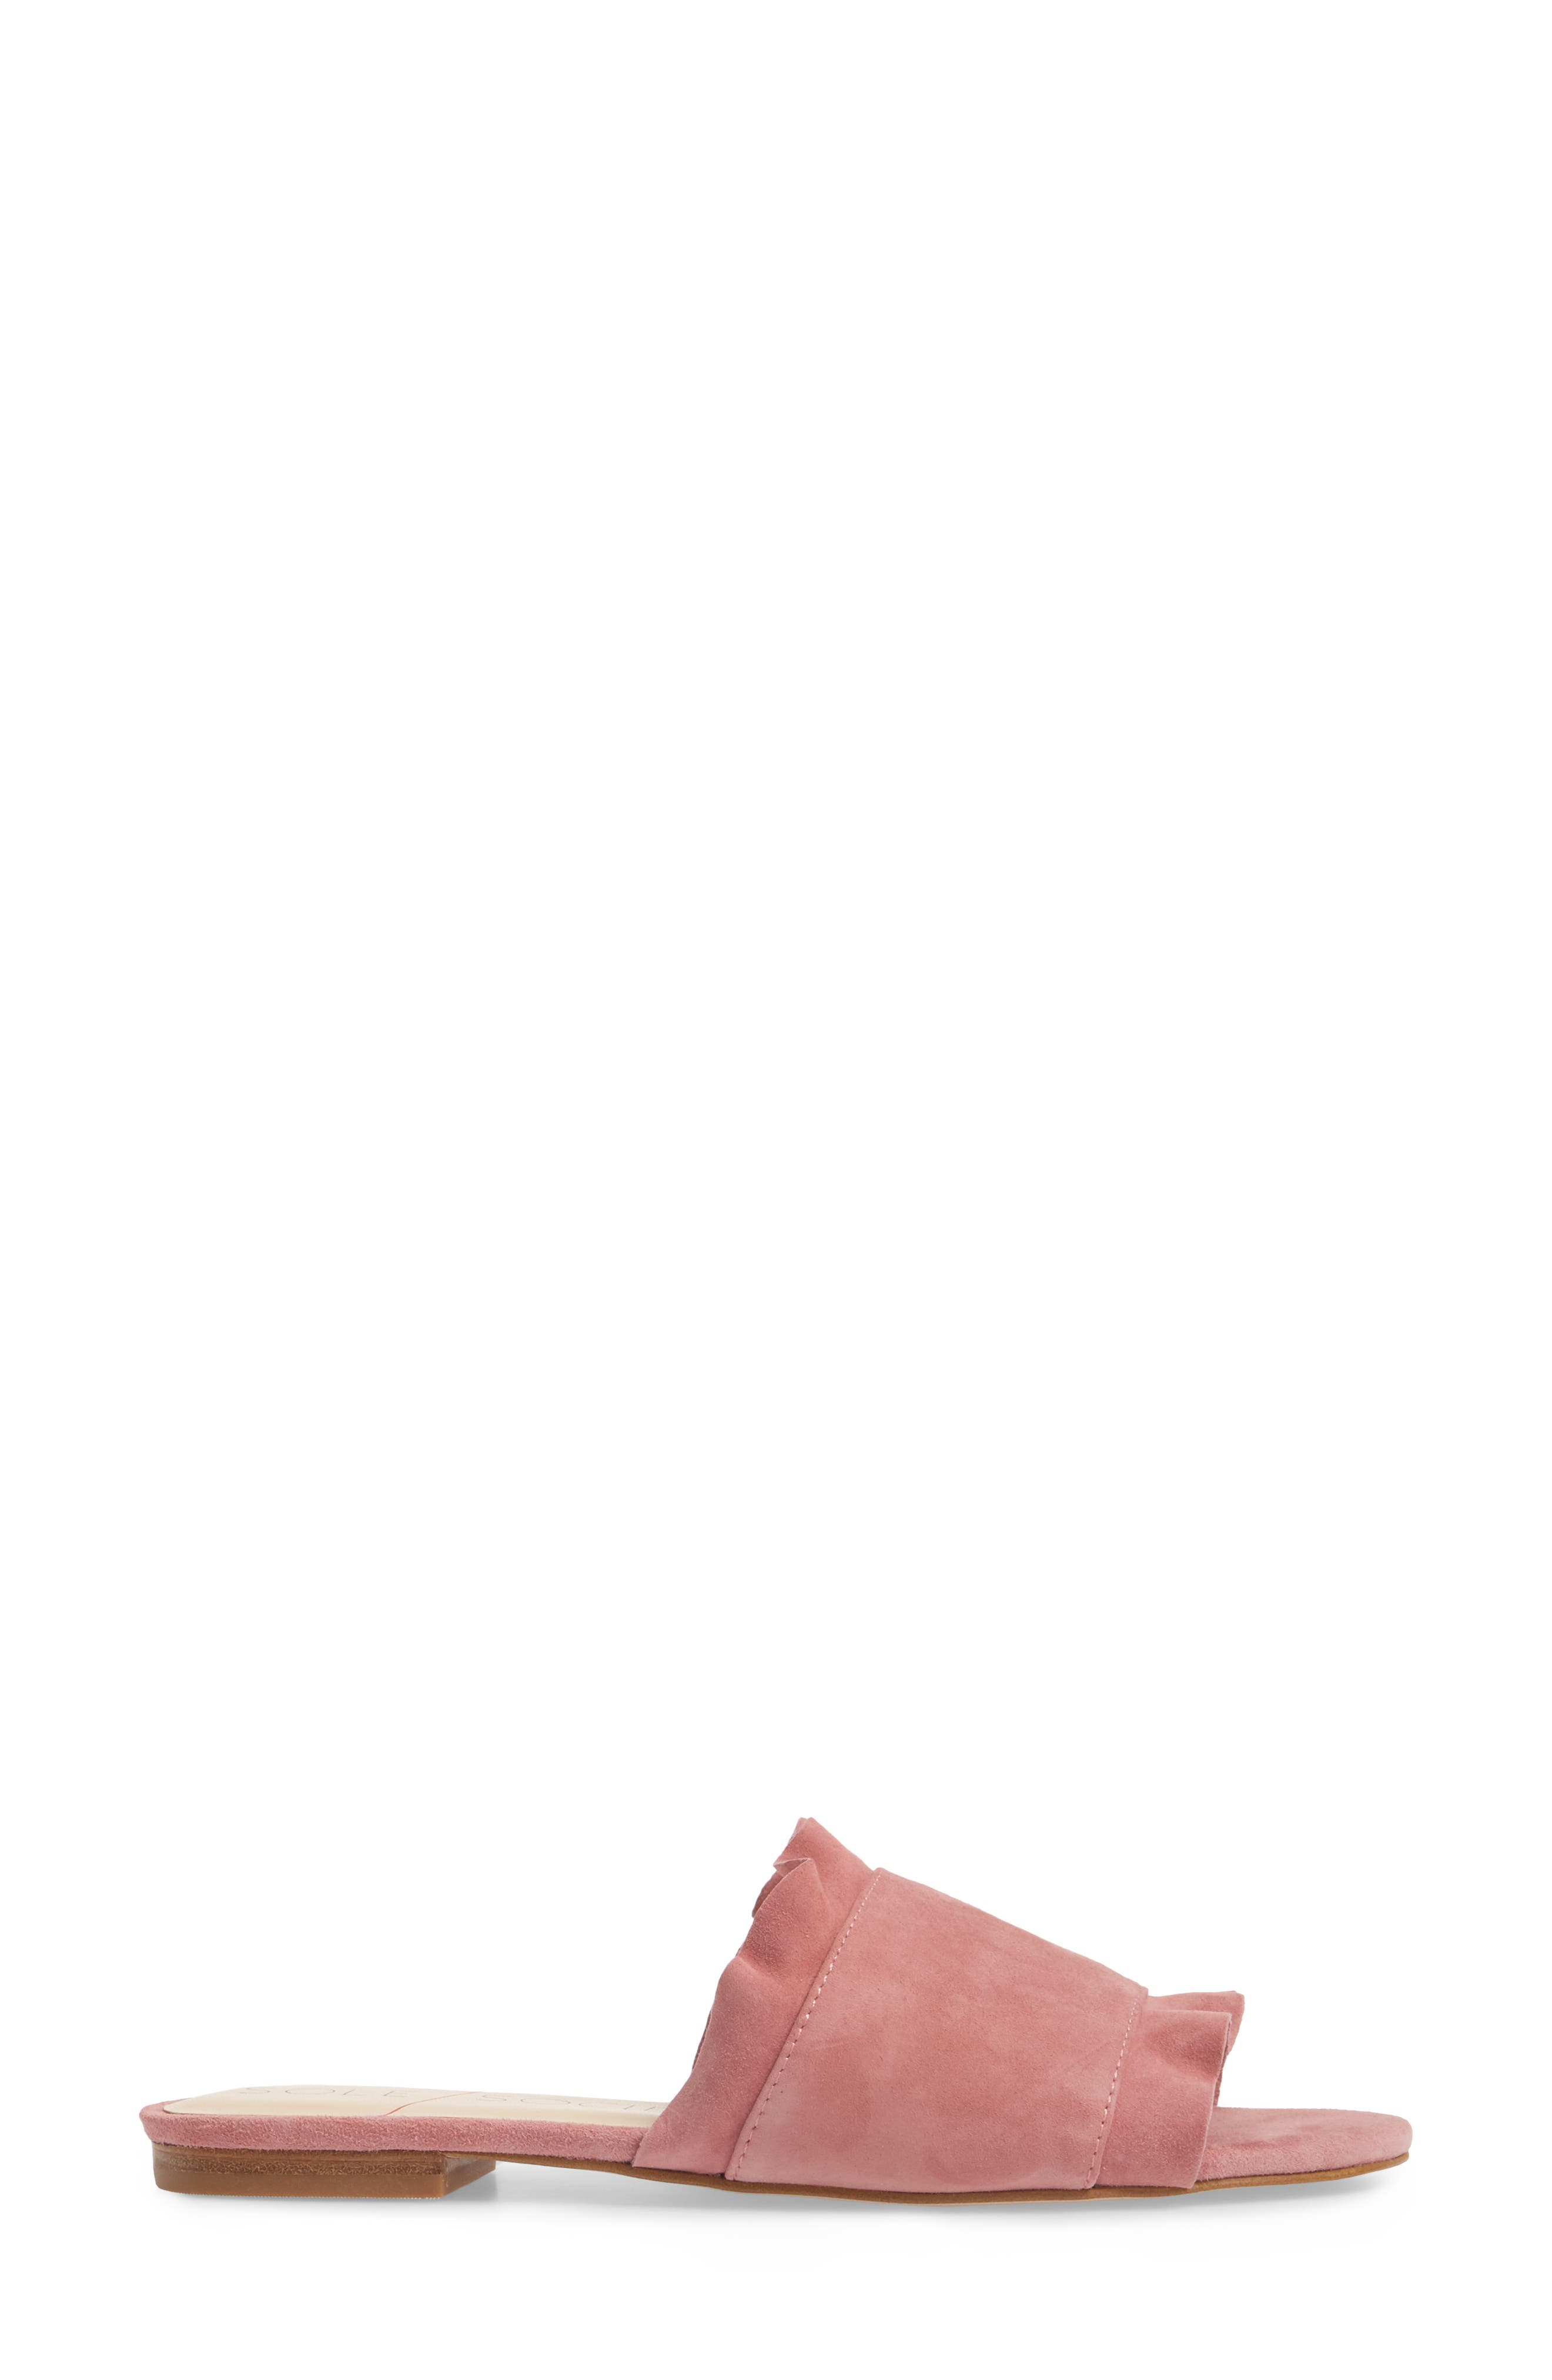 So-Madalayne Flat Sandal,                             Alternate thumbnail 3, color,                             658